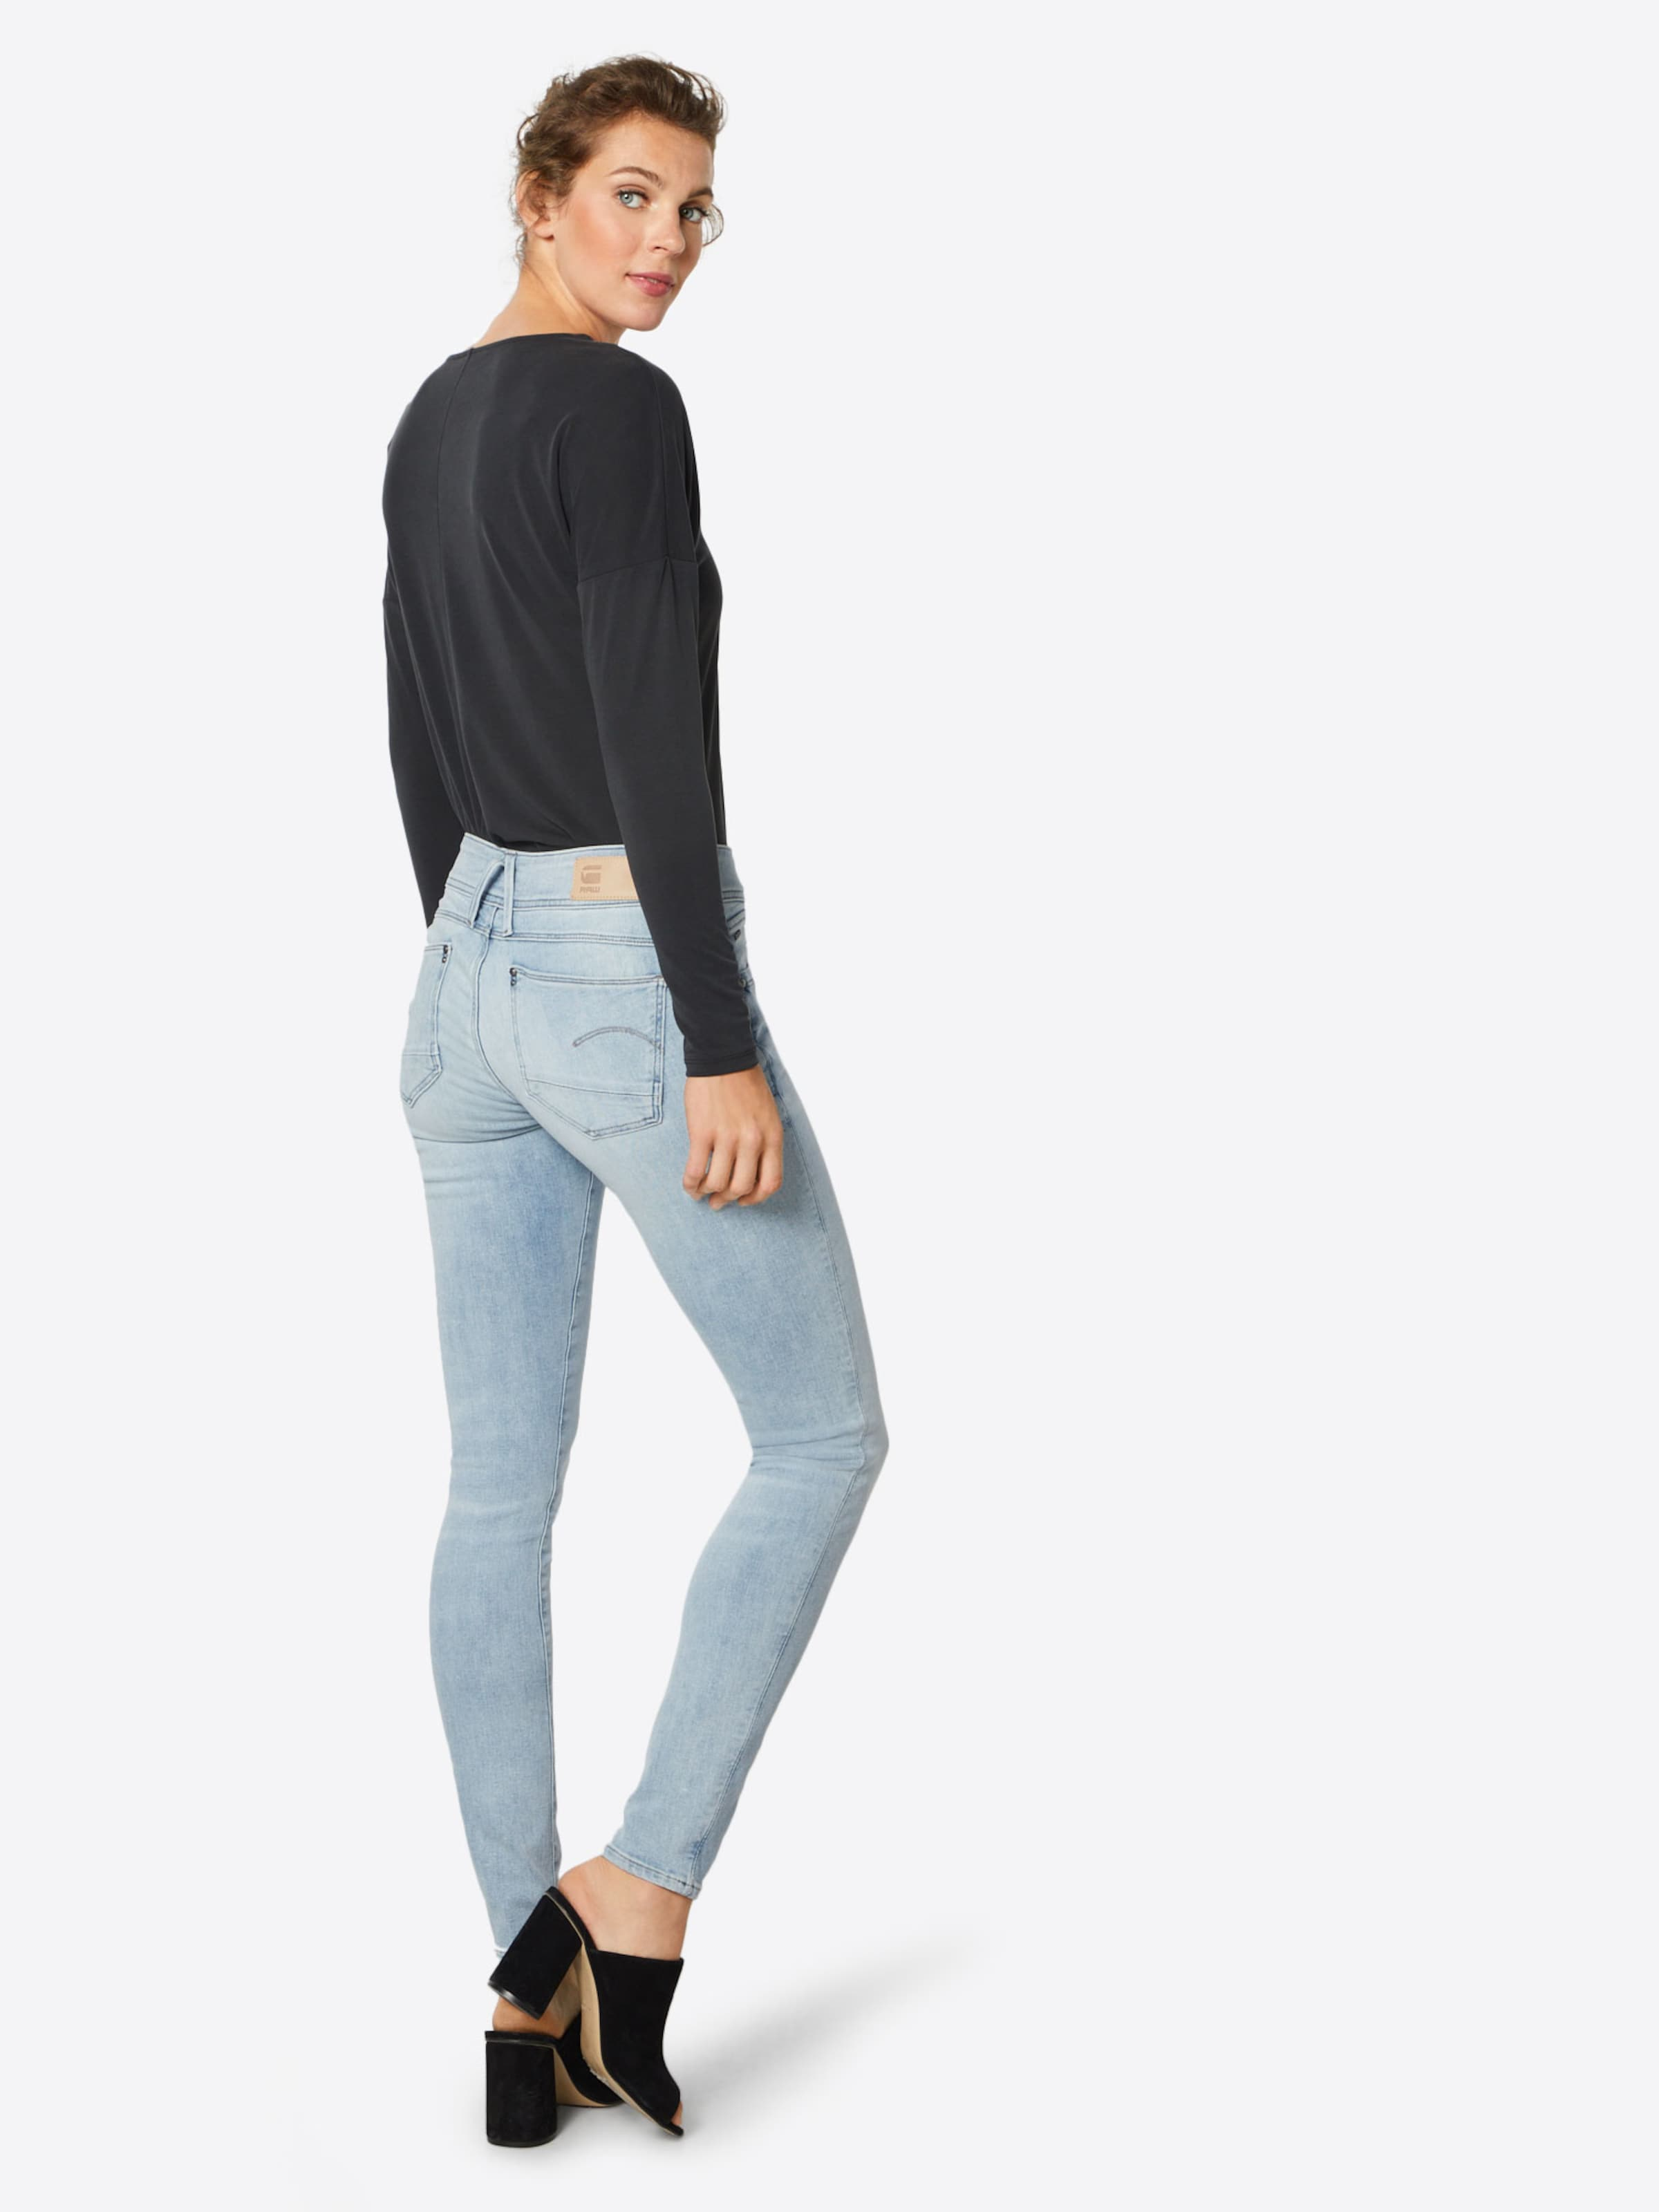 'lynn' G Raw Blue star Denim Jeans In NOwPn0Z8kX